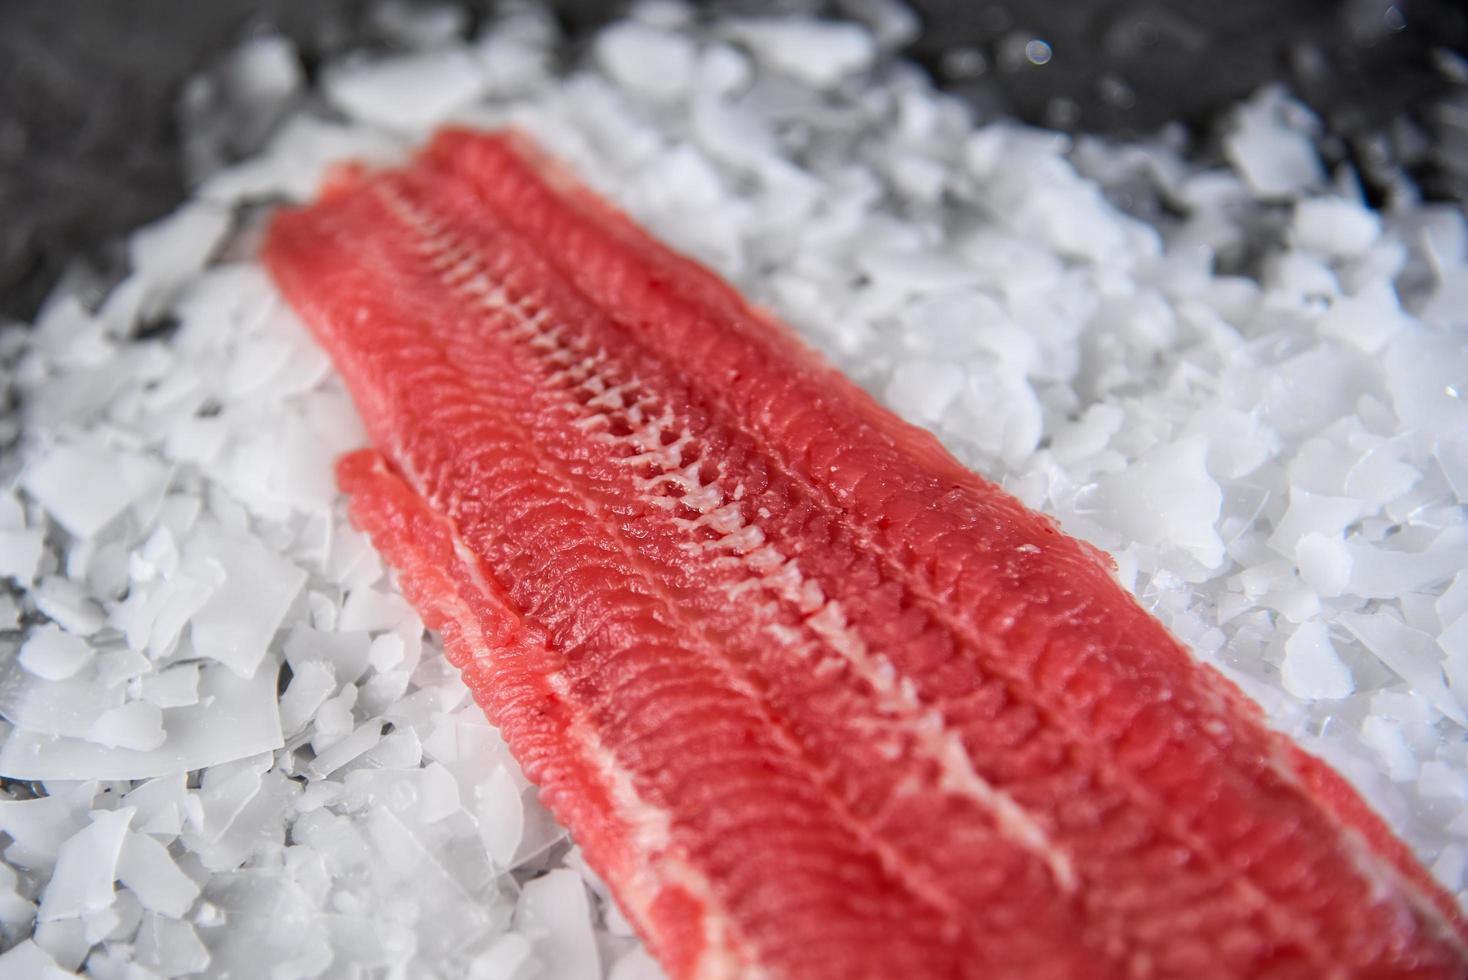 verse rauwe vis steak op ijs over donkere stenen achtergrond foto